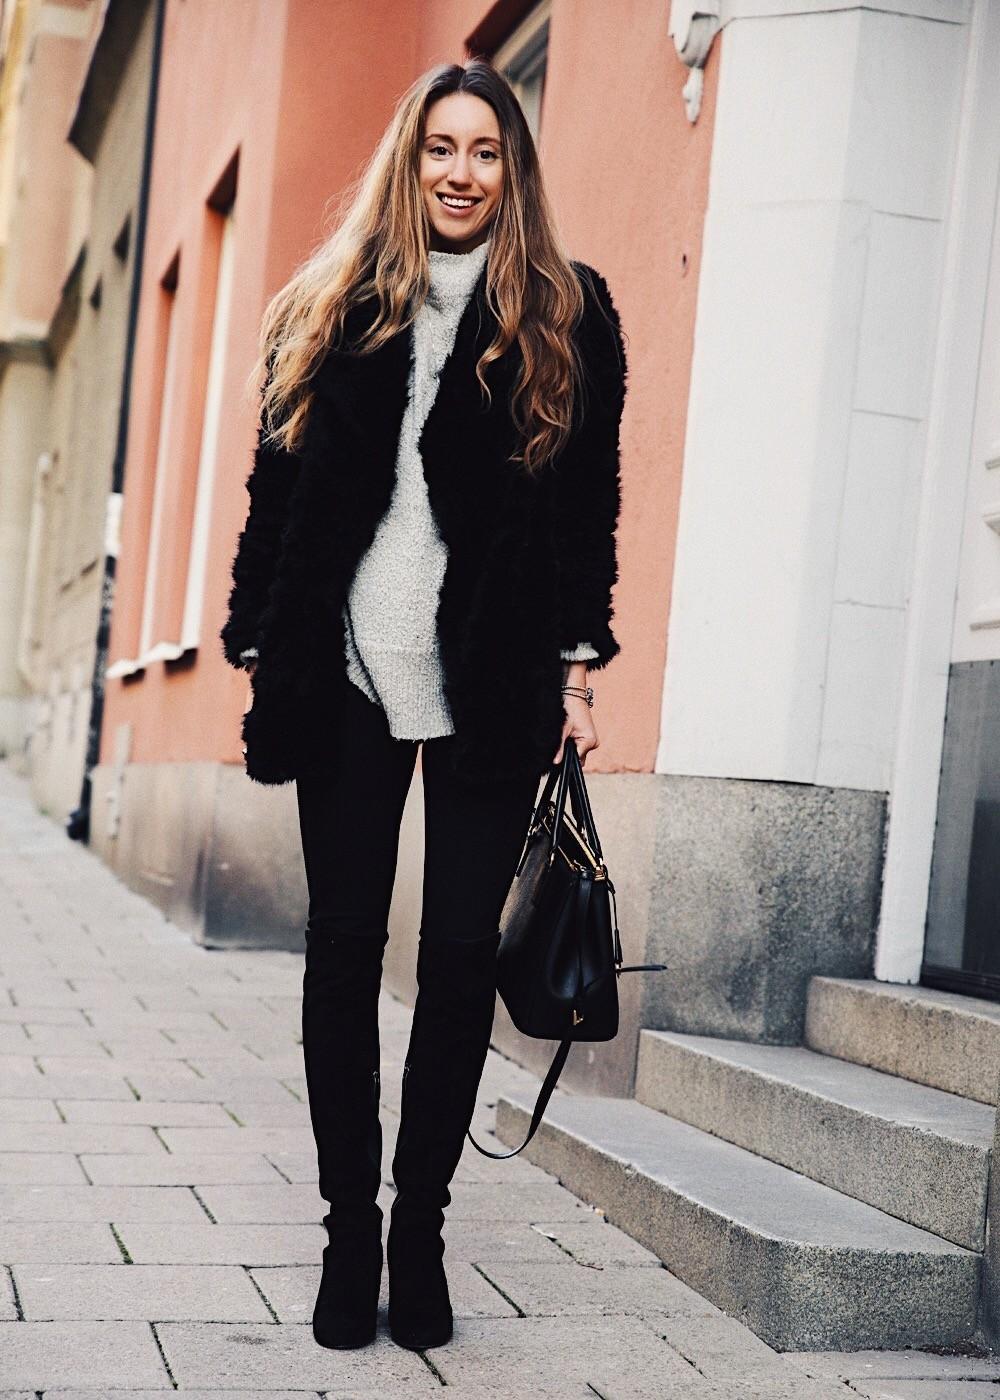 angelica+eldh+blogg